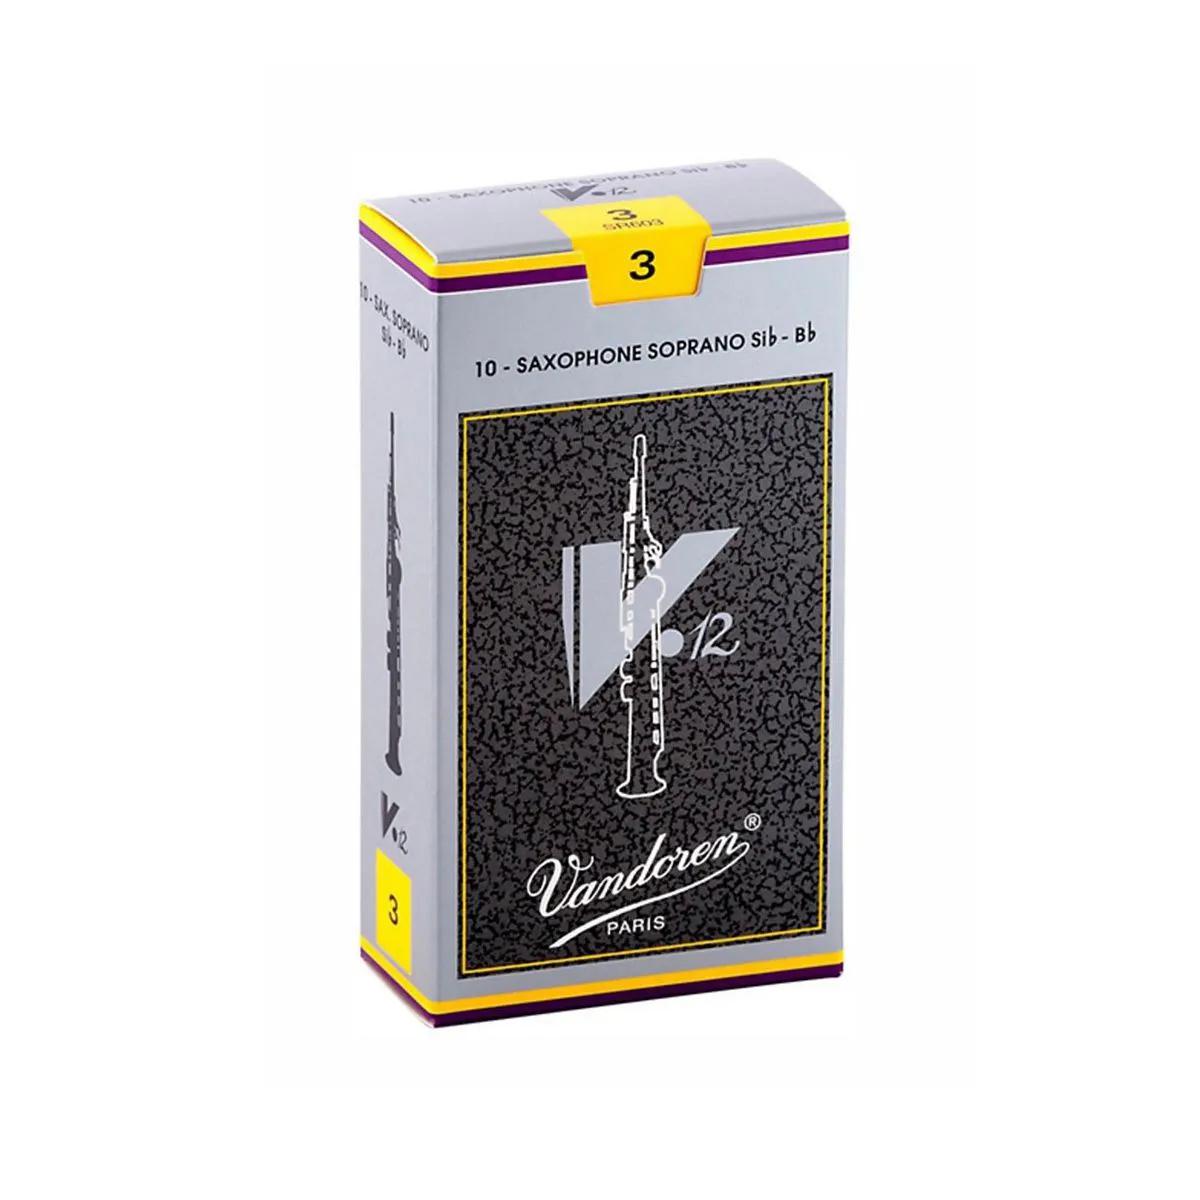 Palheta Vandoren V12 Nº 3 para Sax Soprano